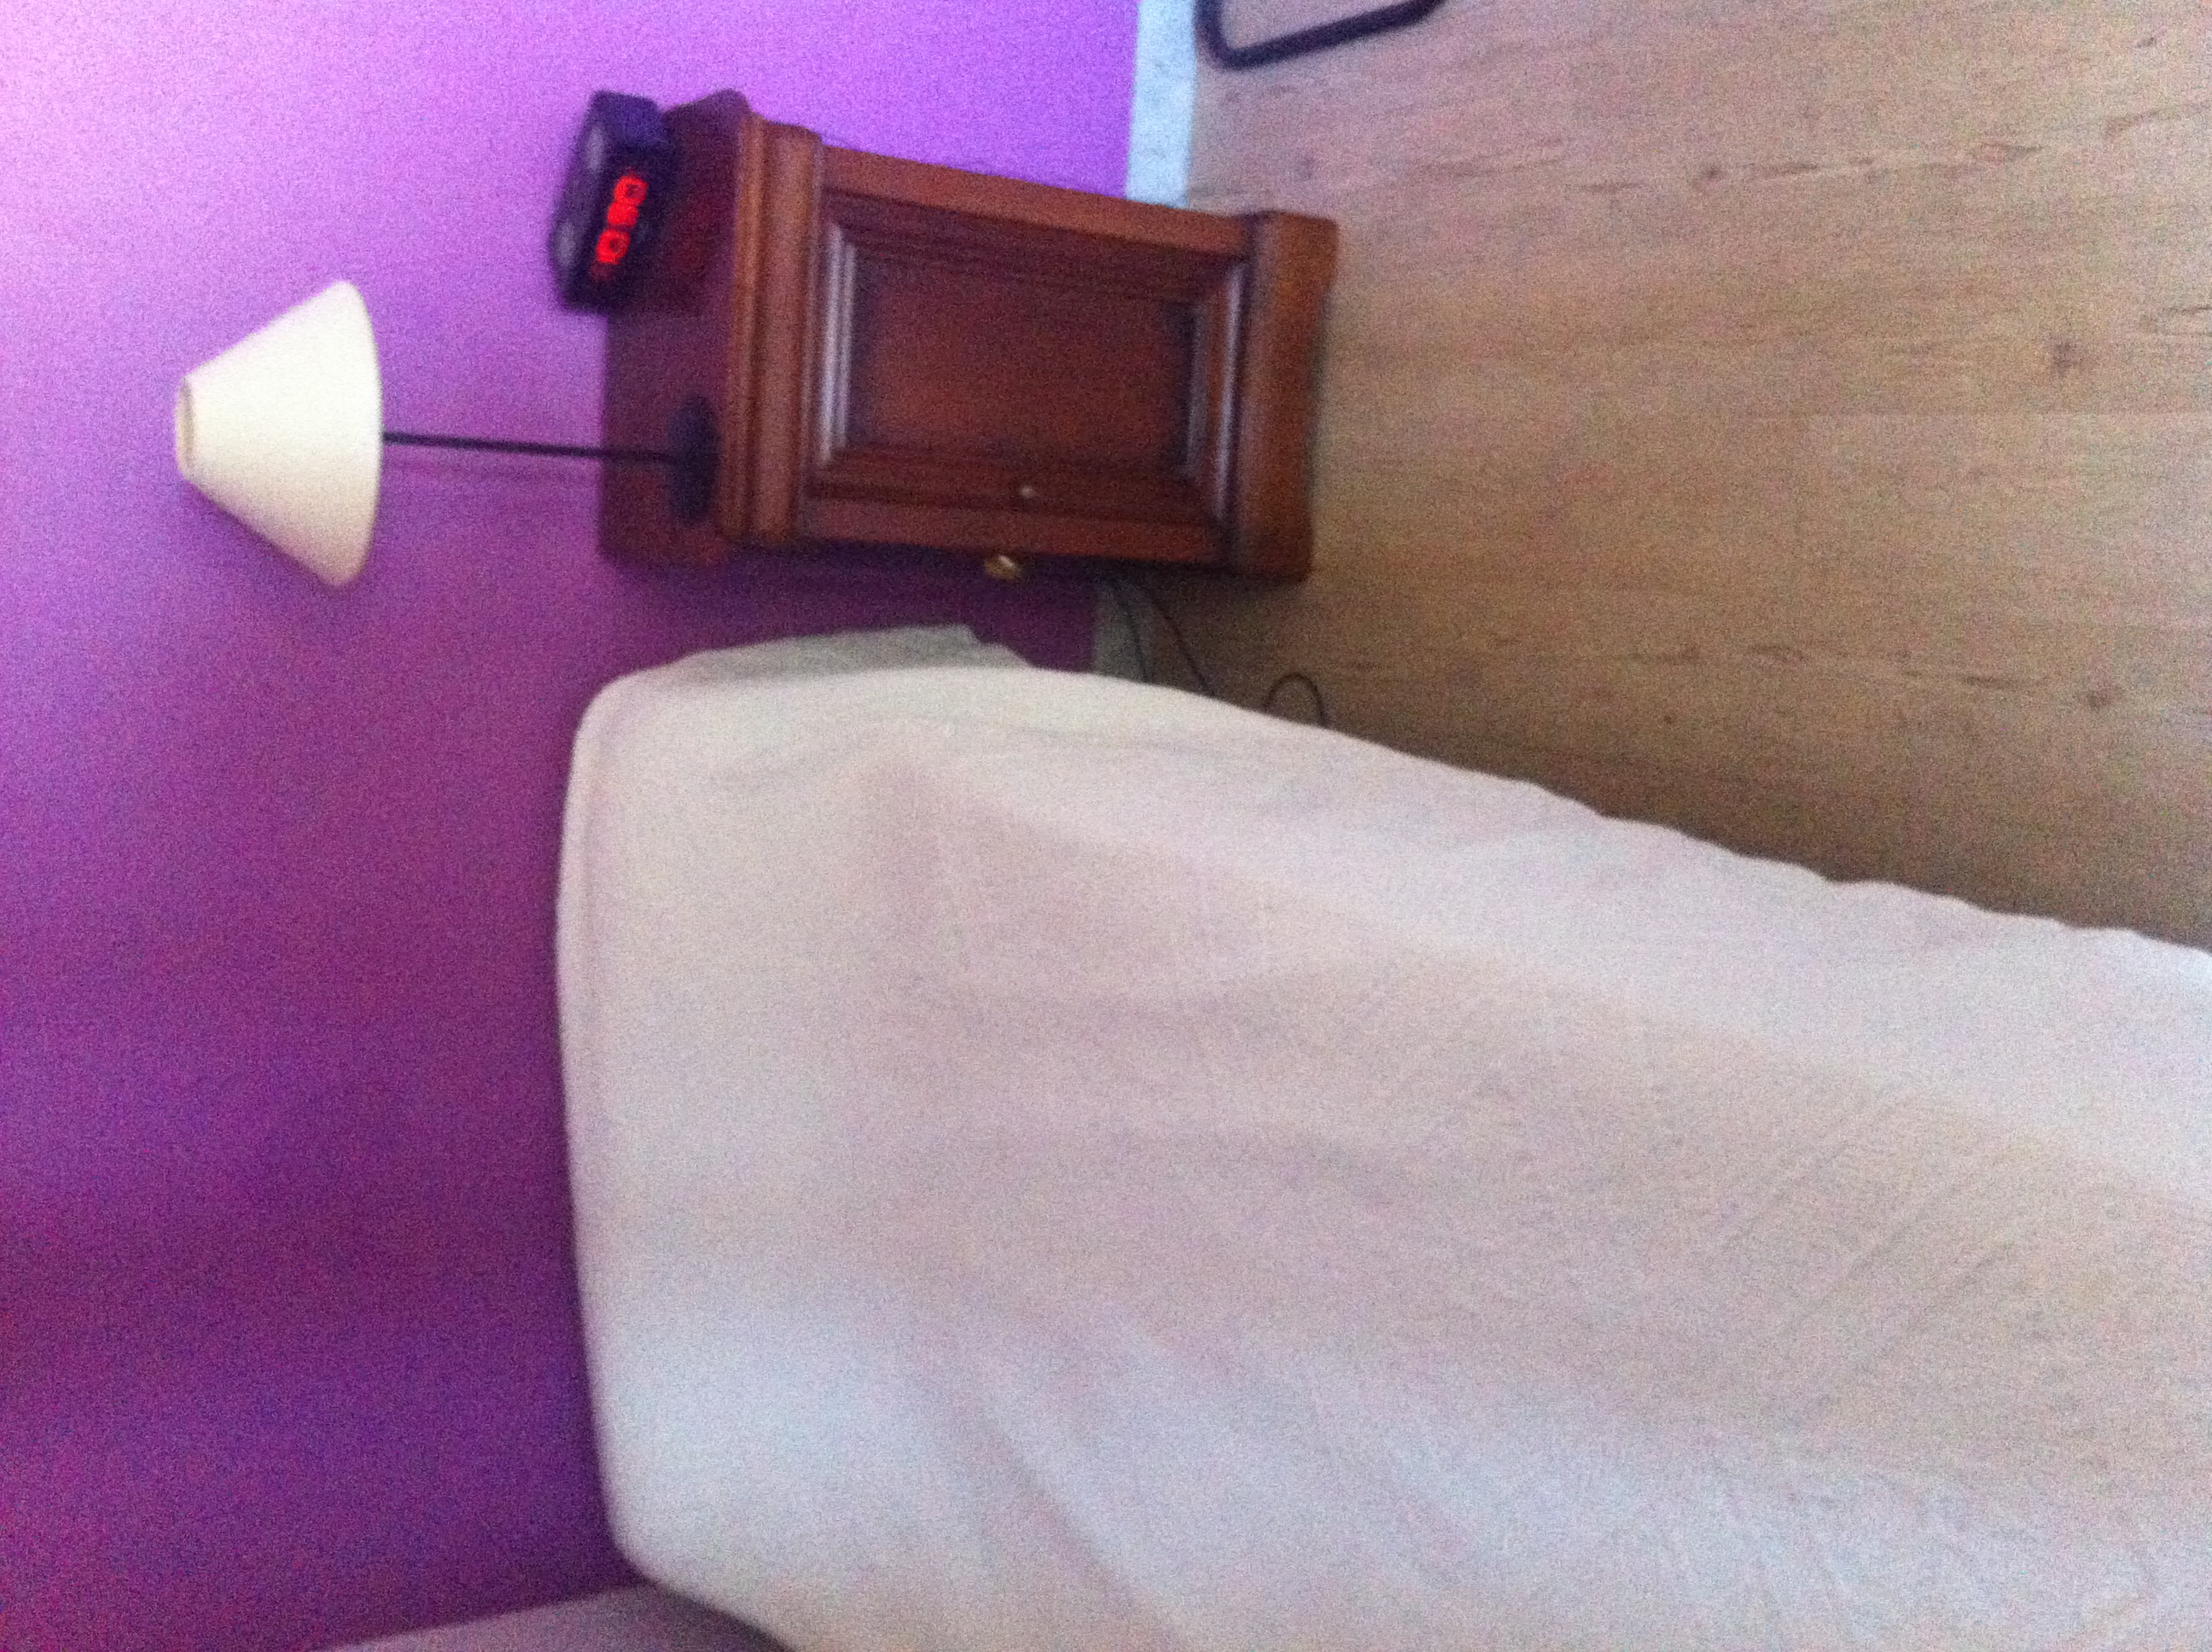 colocation tudiant tudiant et s nior intergenerationnelle. Black Bedroom Furniture Sets. Home Design Ideas